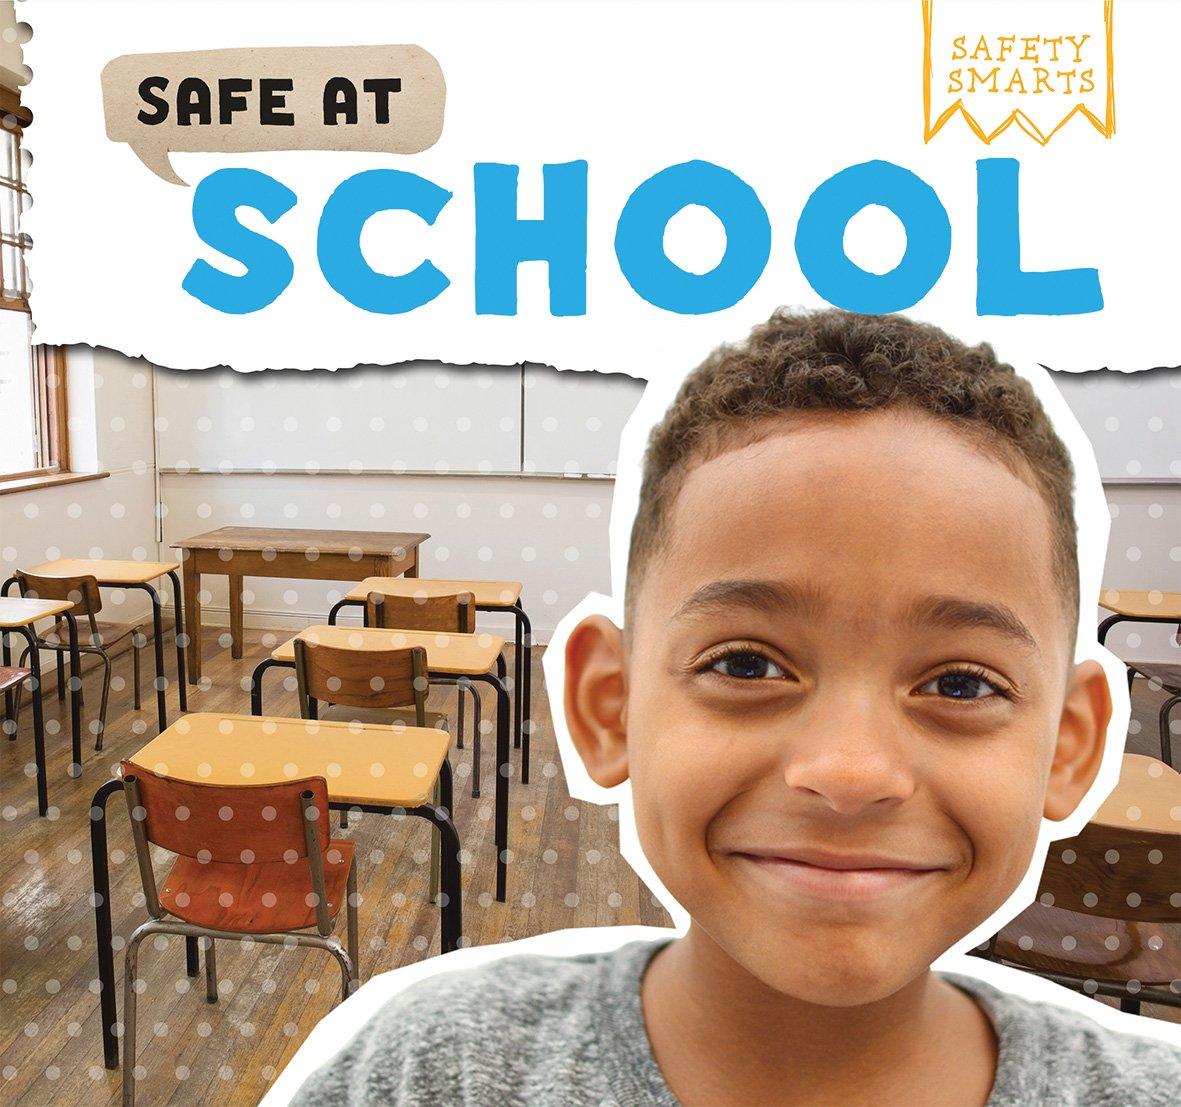 Safe at School (Safety Smarts)